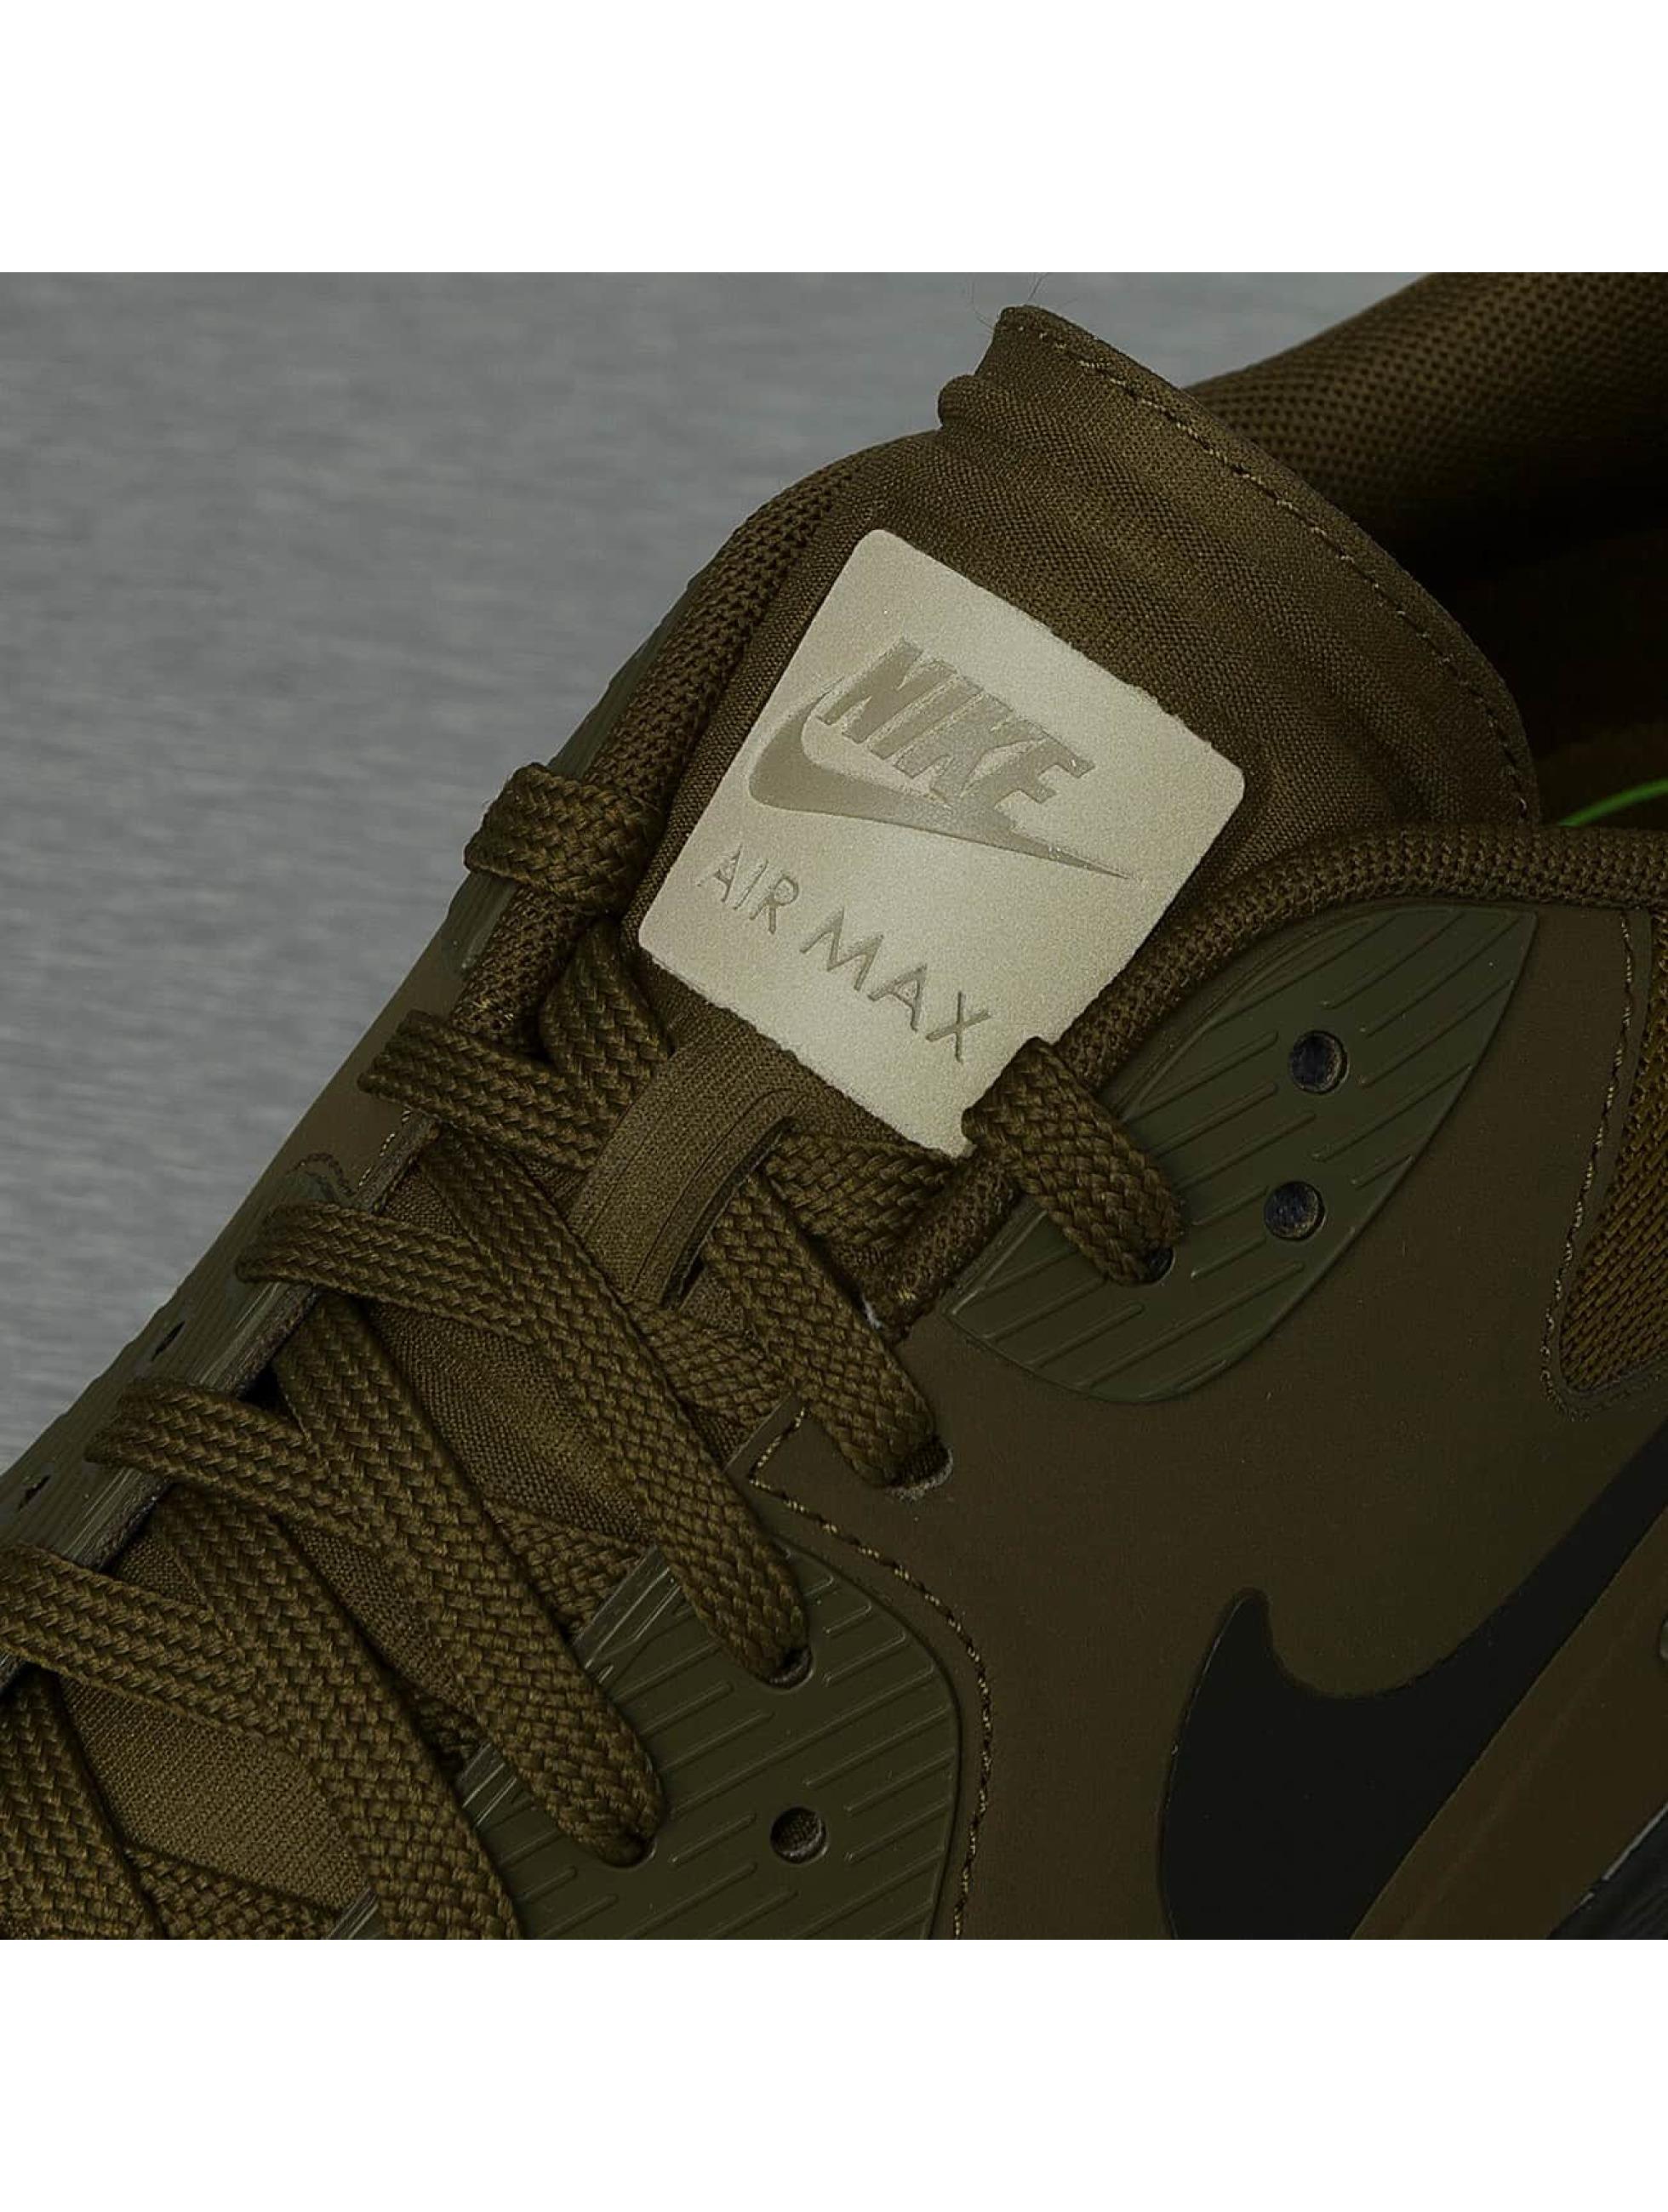 Nike Zapatillas de deporte Air Max 90 Ultra 2.0 SE caqui